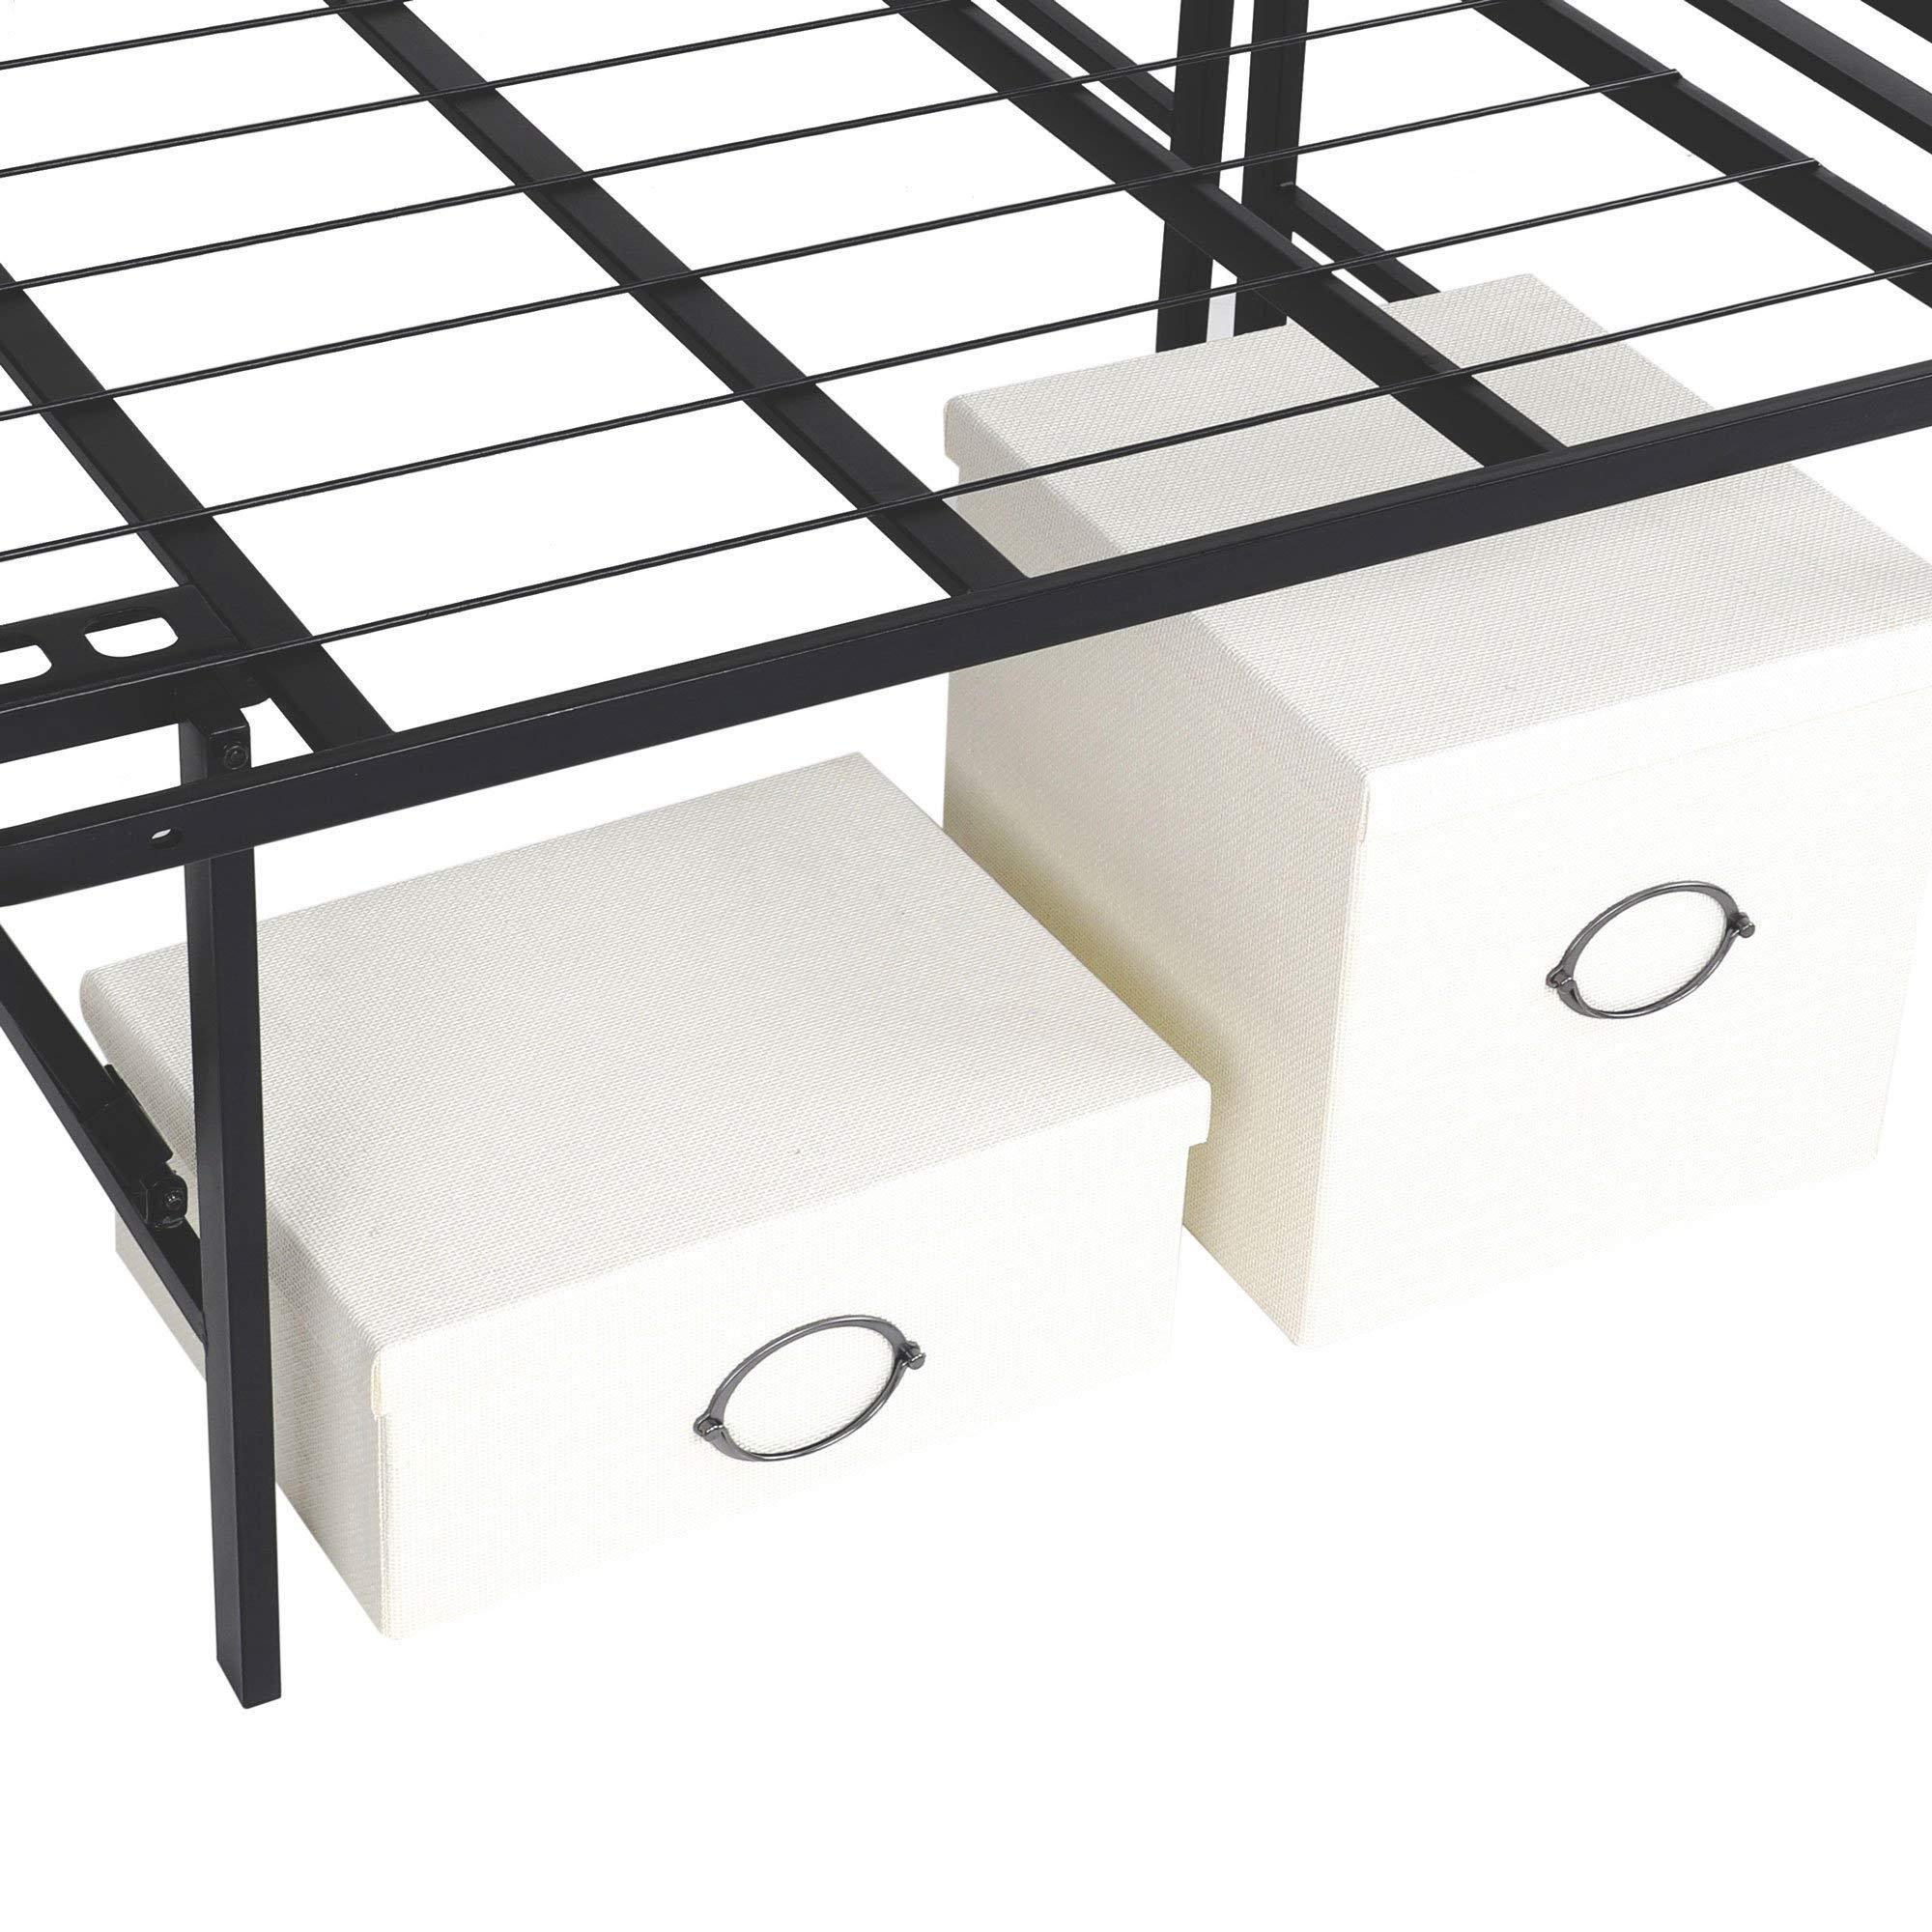 intelliBASE Lightweight Easy Set Up Bifold Platform Black Metal Bed Frame, Queen